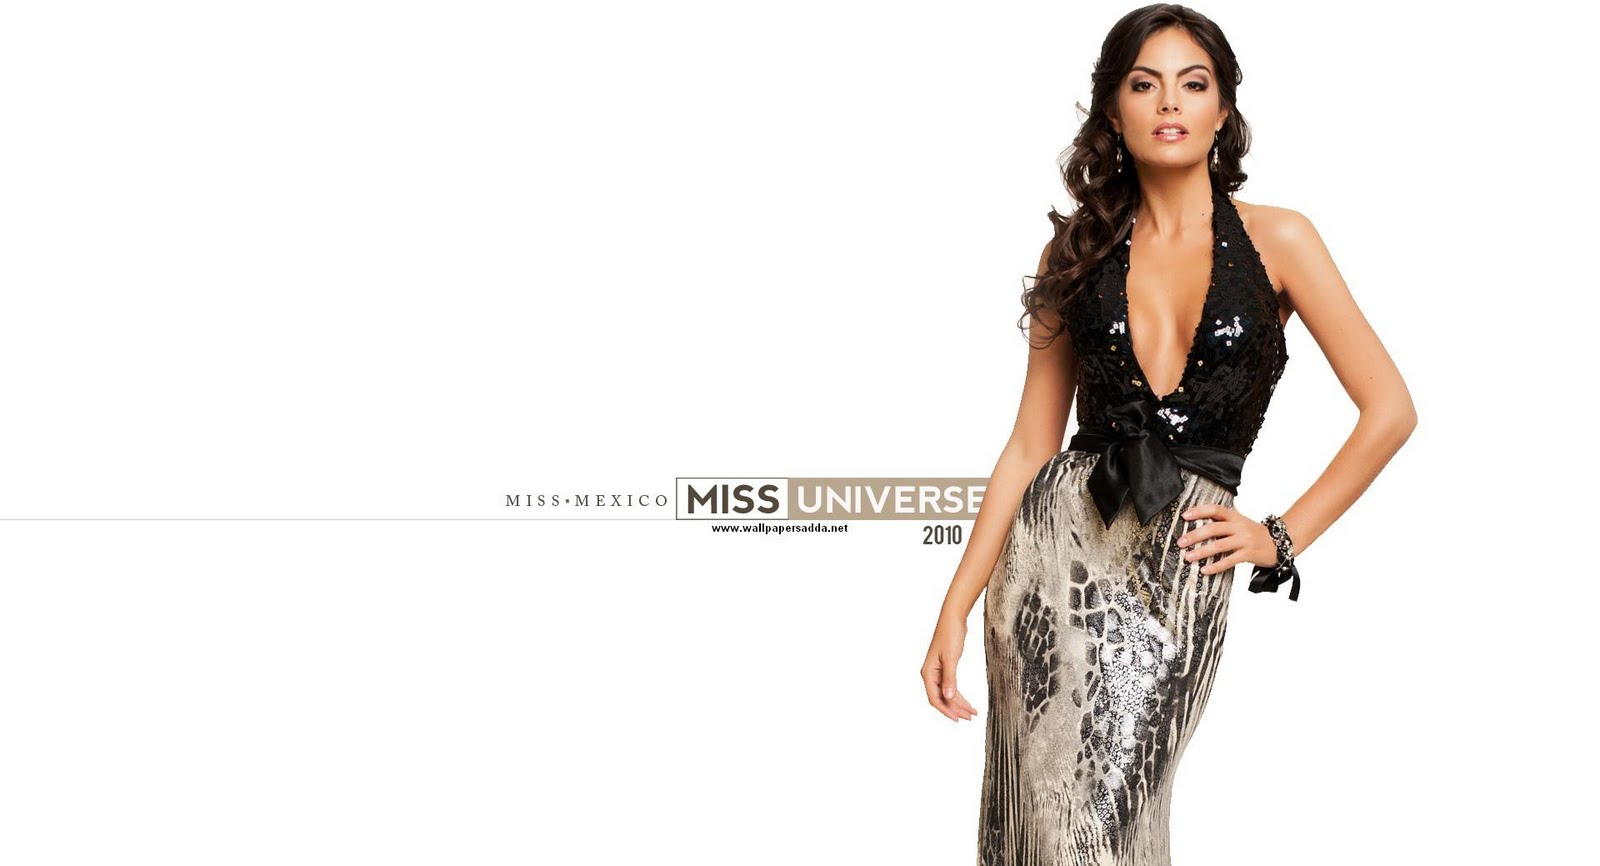 http://4.bp.blogspot.com/_H2zQH59x_o0/THP-xty8UiI/AAAAAAAAE7Y/f2sVSHPWYyA/s1600/miss-universe2010+wallpapers2.jpg